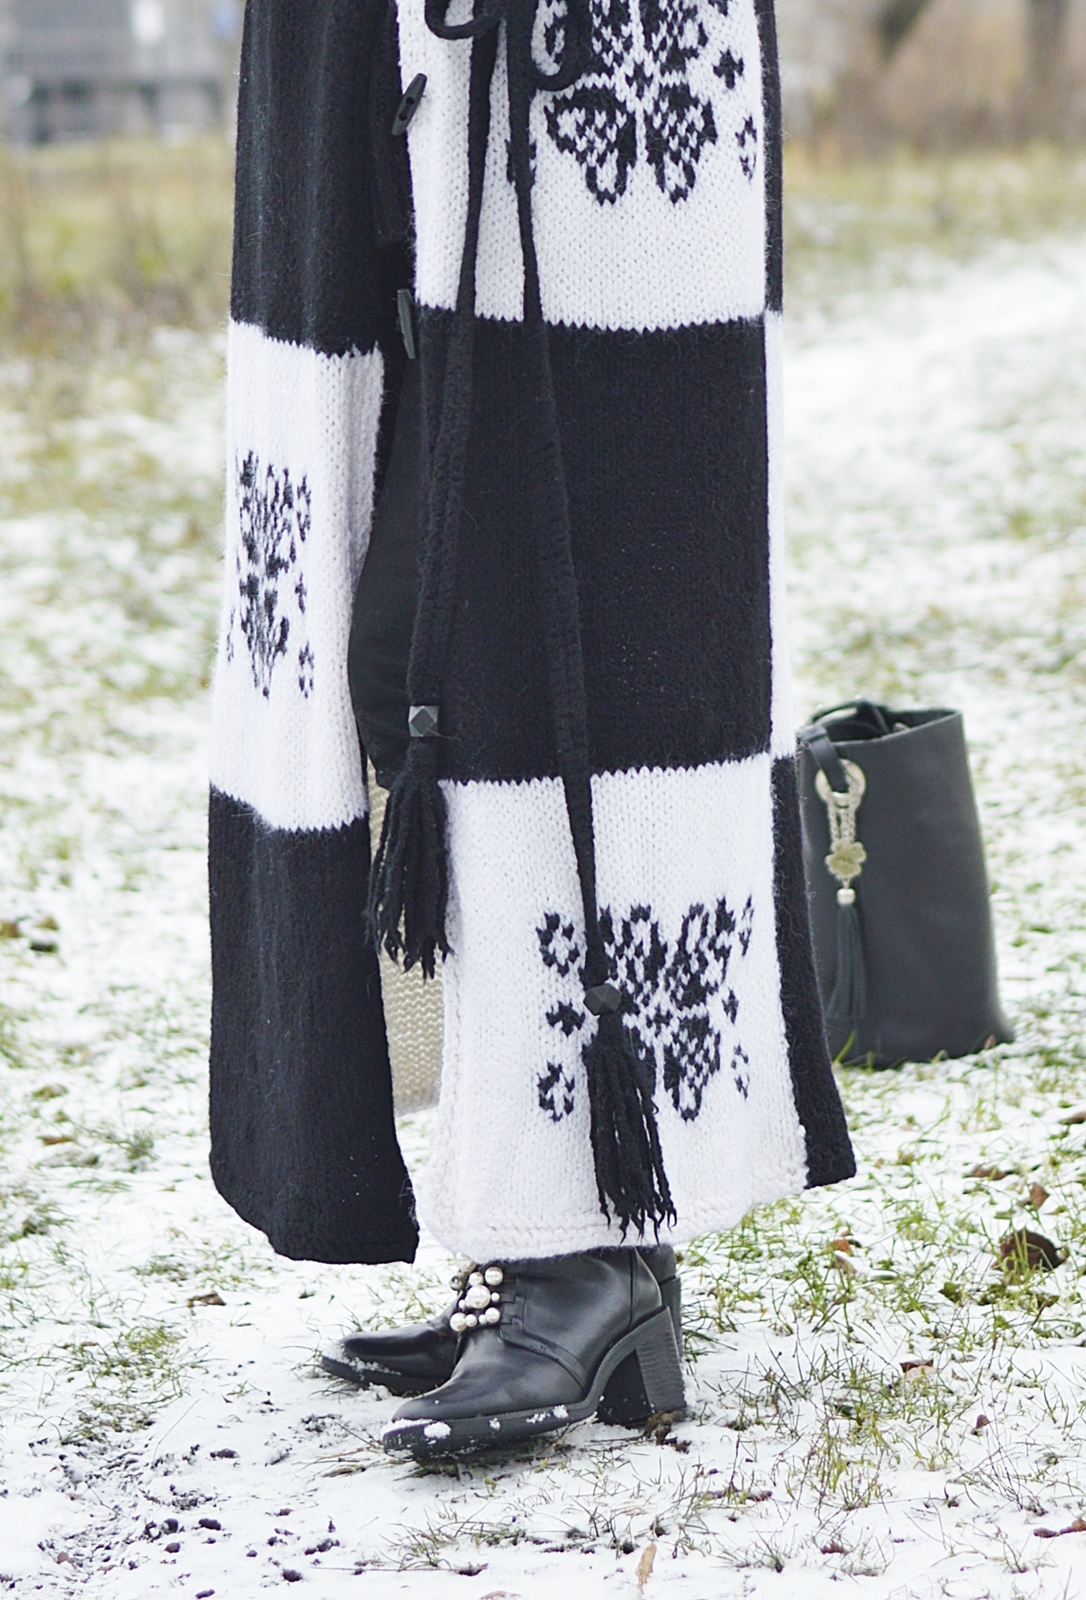 Polish designer, Hand made designer, Black and white fashion